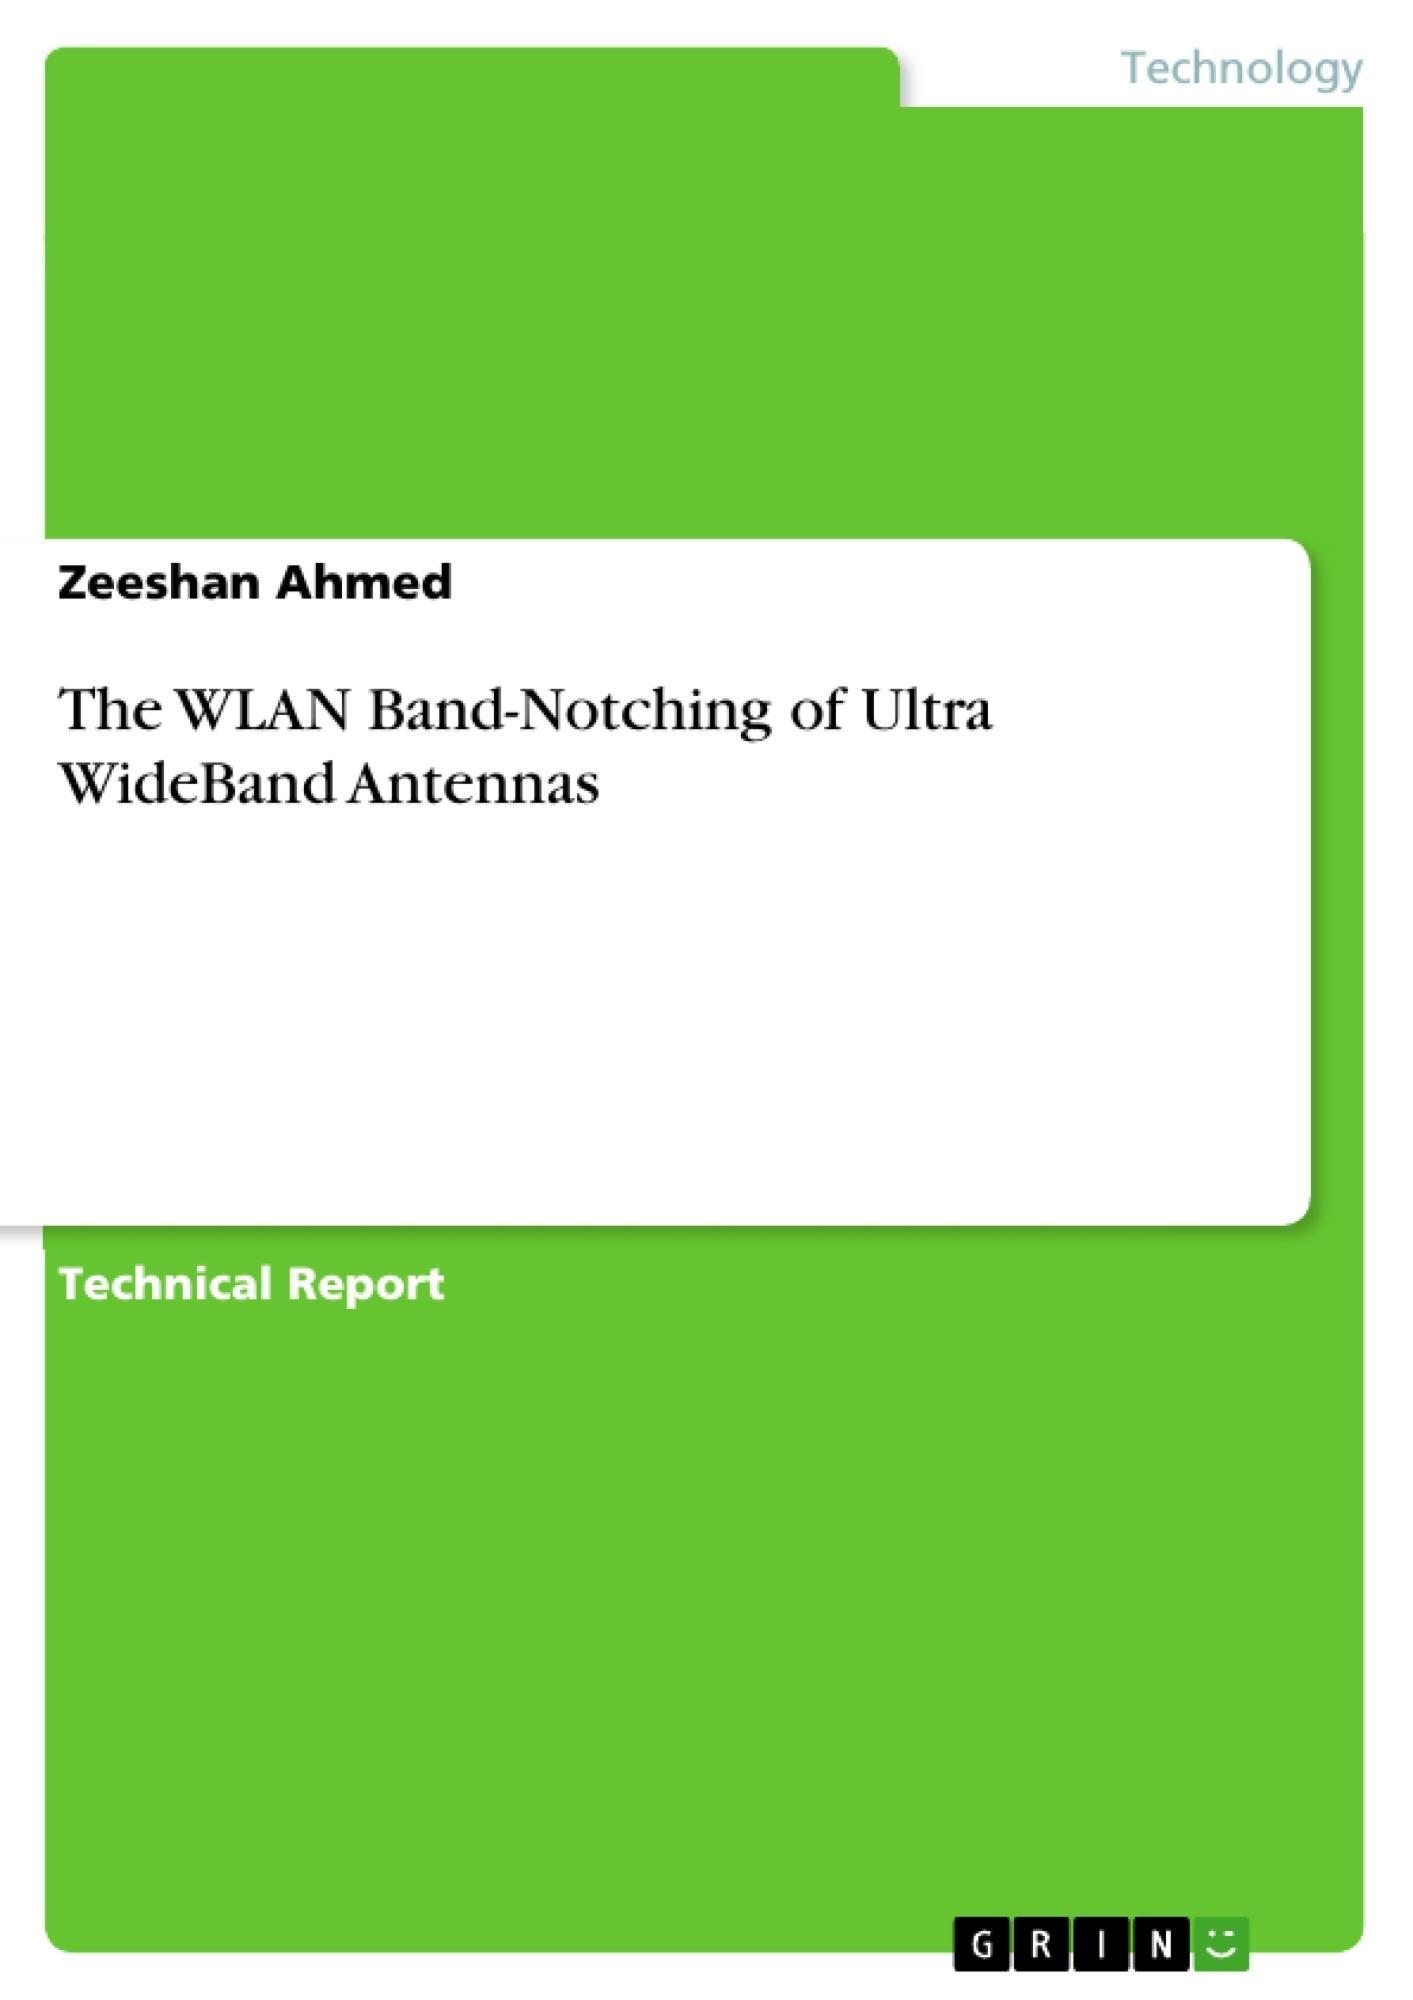 Title: The WLAN Band-Notching of Ultra WideBand Antennas